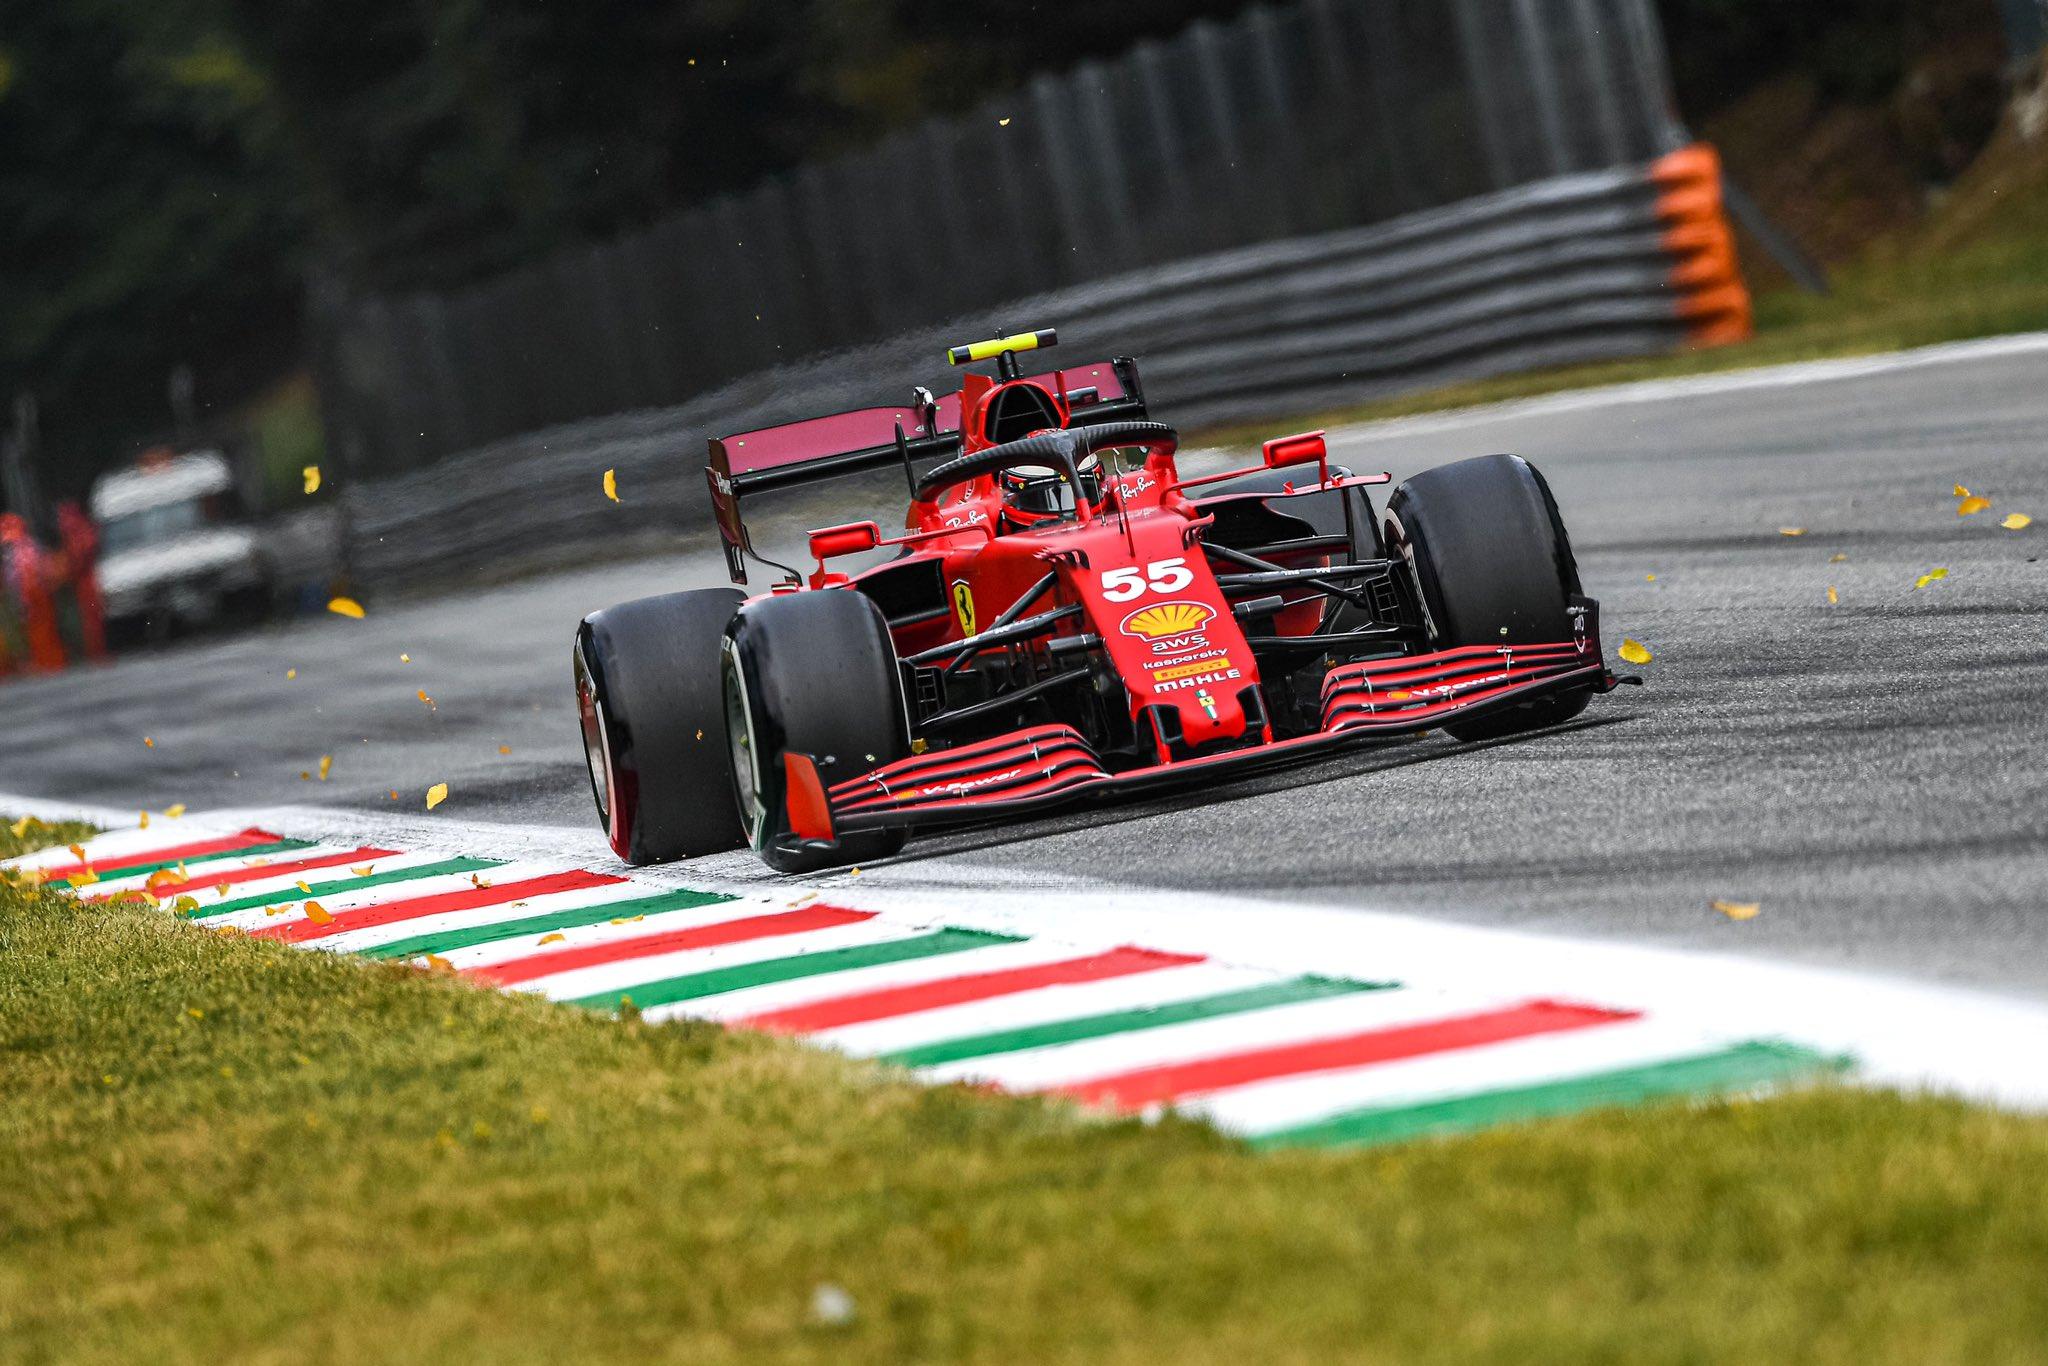 Carlos Sainz, Ferrari, GP Italy Monza F1/2021  credit: @Scuderia Ferrari Twitter